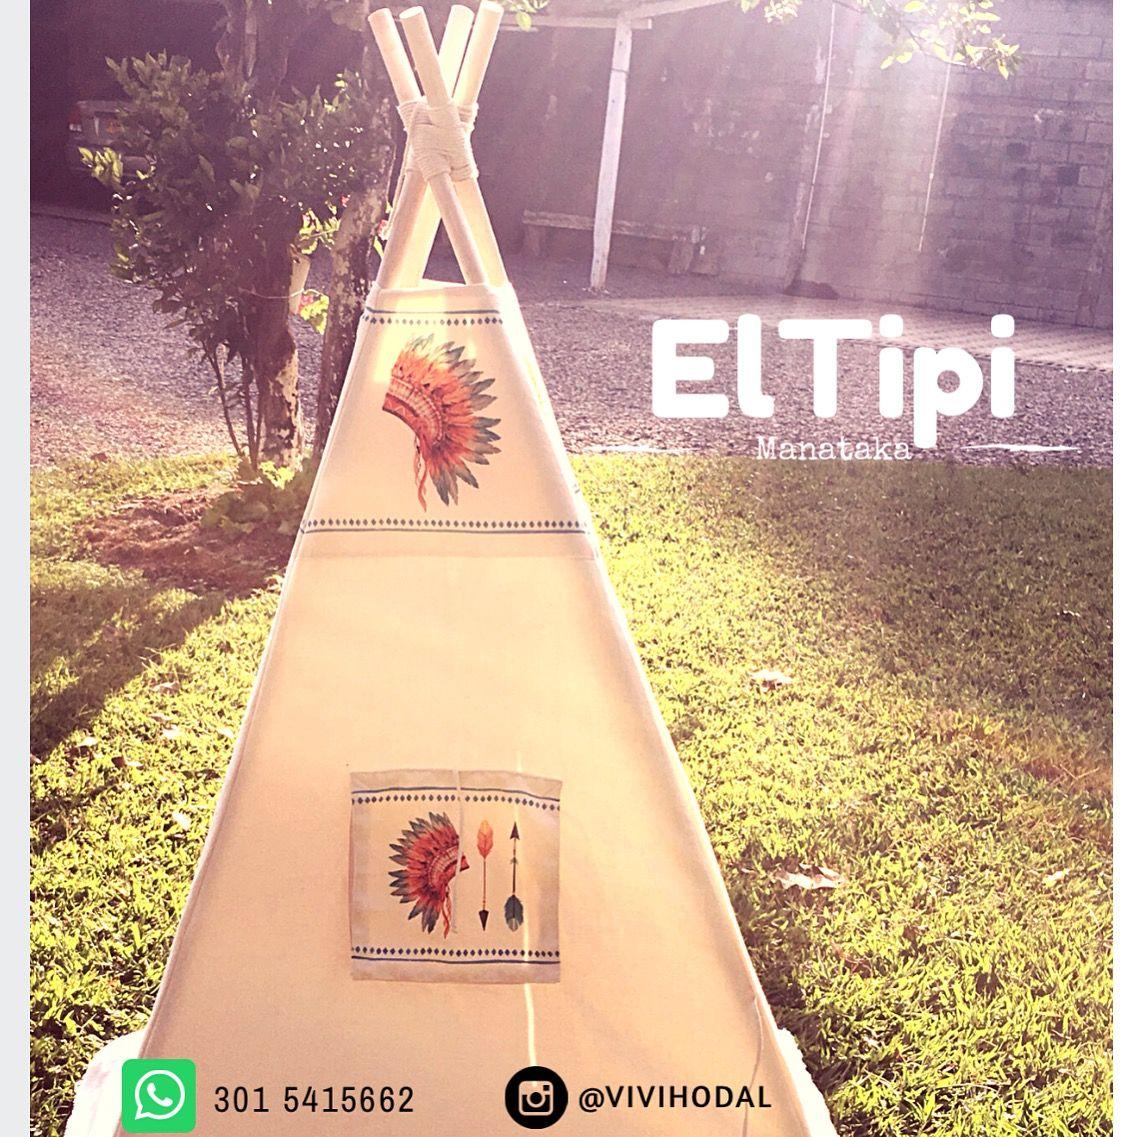 ¿Ya compraste #ElTipi para tu niñ@, sobrin@ o amiguit@?..¡Haz tu pedido! ☎️+57 3015415662 #Tipi #Teepee #Teepe #Tepee #familia #regalosoriginales #regalosniños #regalosniñas #regalosniñasyniños #hechoencolombia